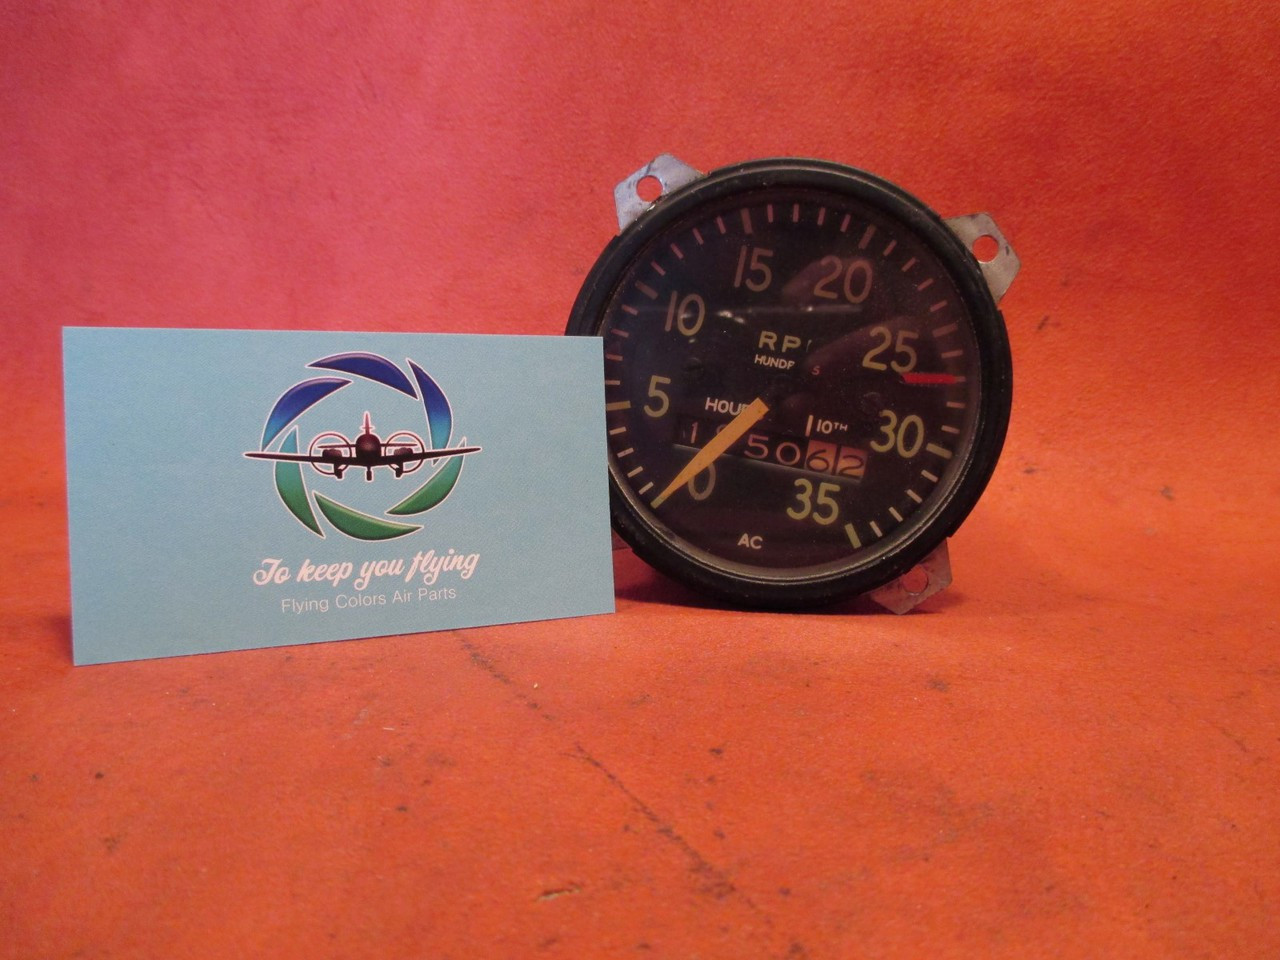 A C  Div  G  M  C  RPM Gauge/Hour Meter